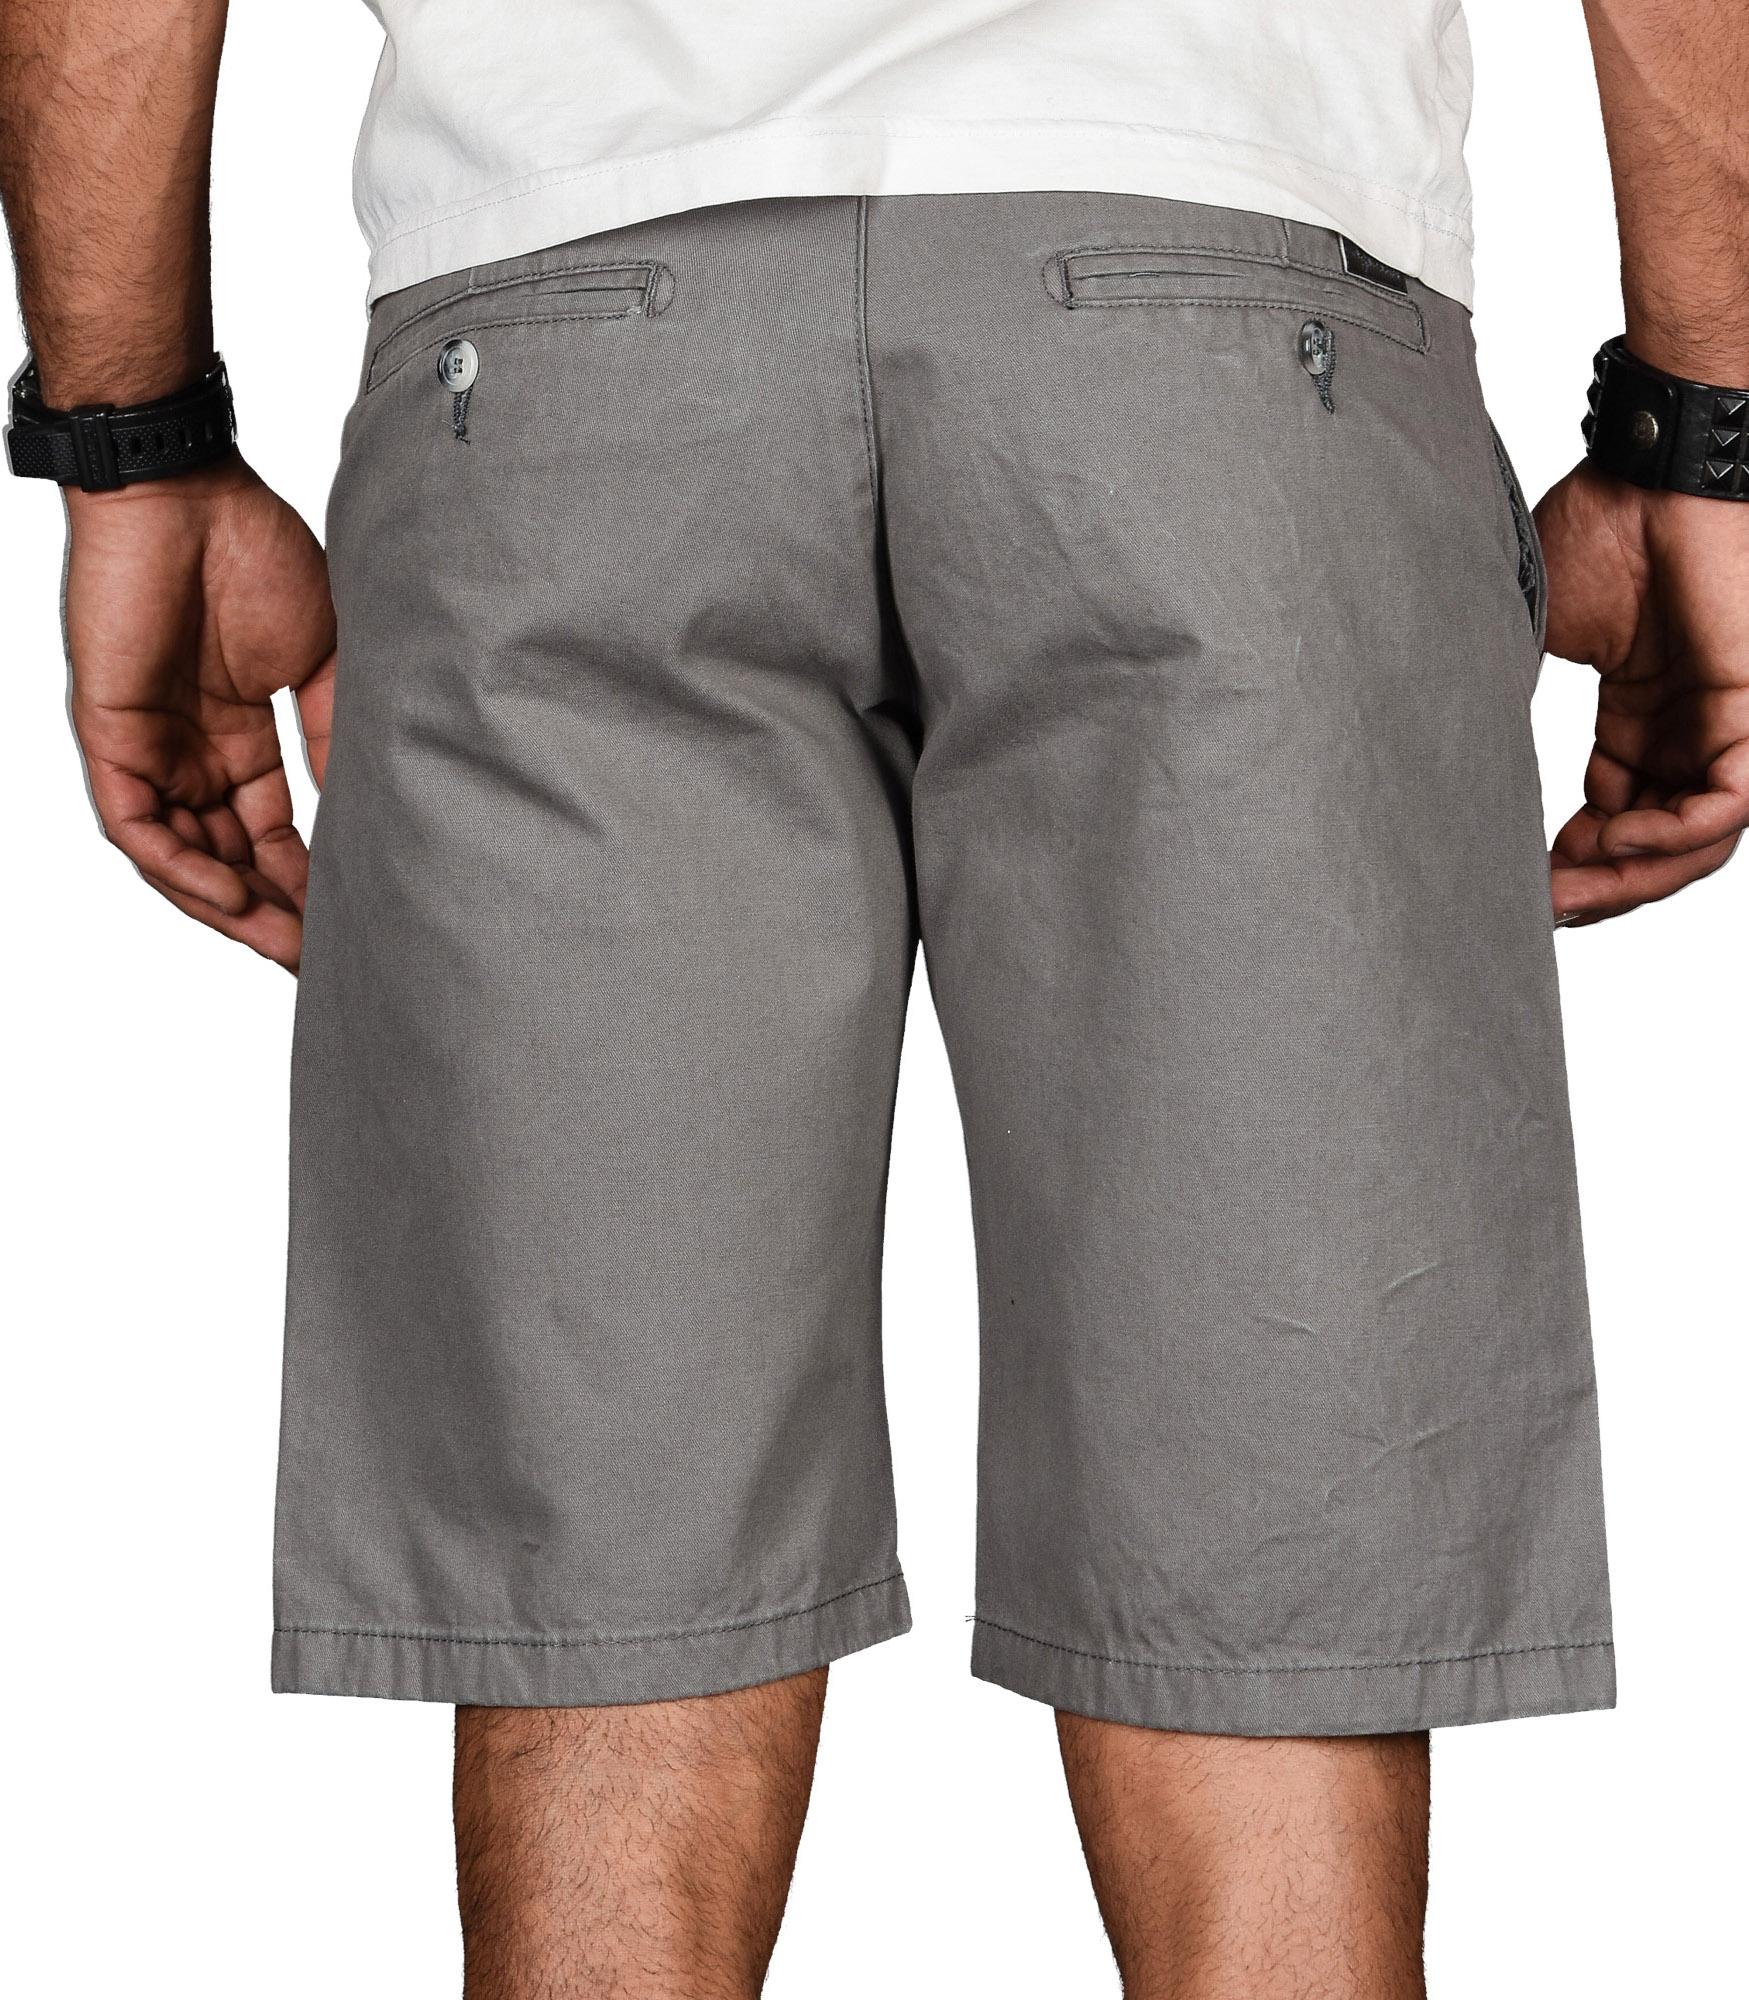 A-Salvarini-Herren-Shorts-kurze-Sommer-Hose-mit-Guertel-Short-Bermuda-NEU-AS096 Indexbild 19